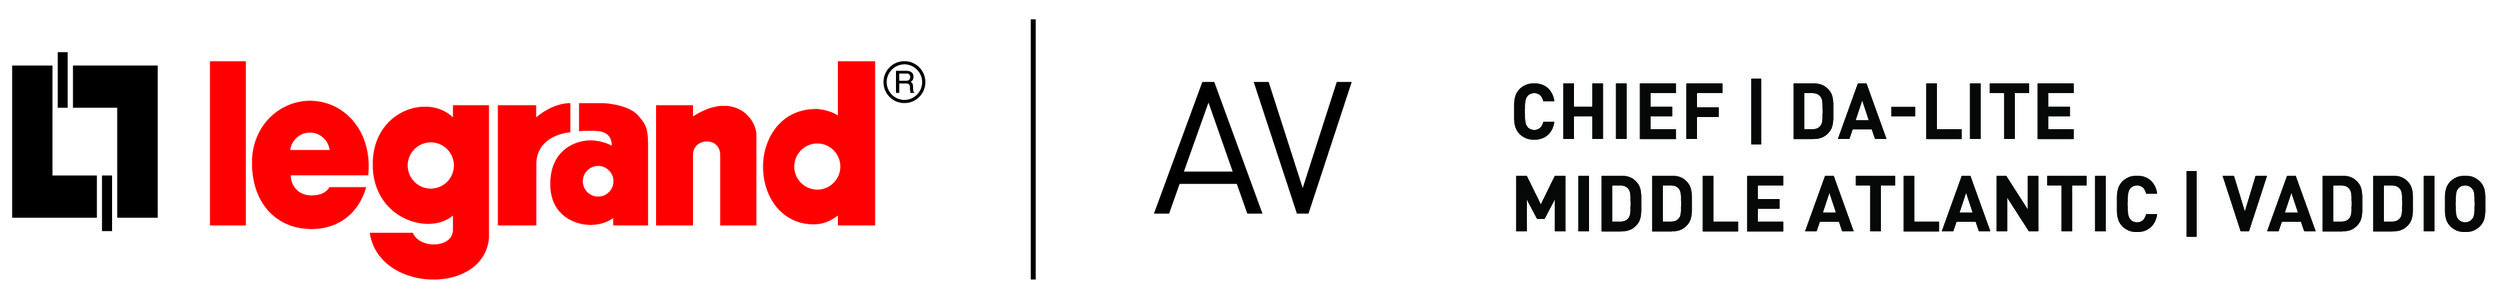 LEGRAND-AV-with-text-Chief-Da-Lite-MAP-Vaddio_NEW.jpg